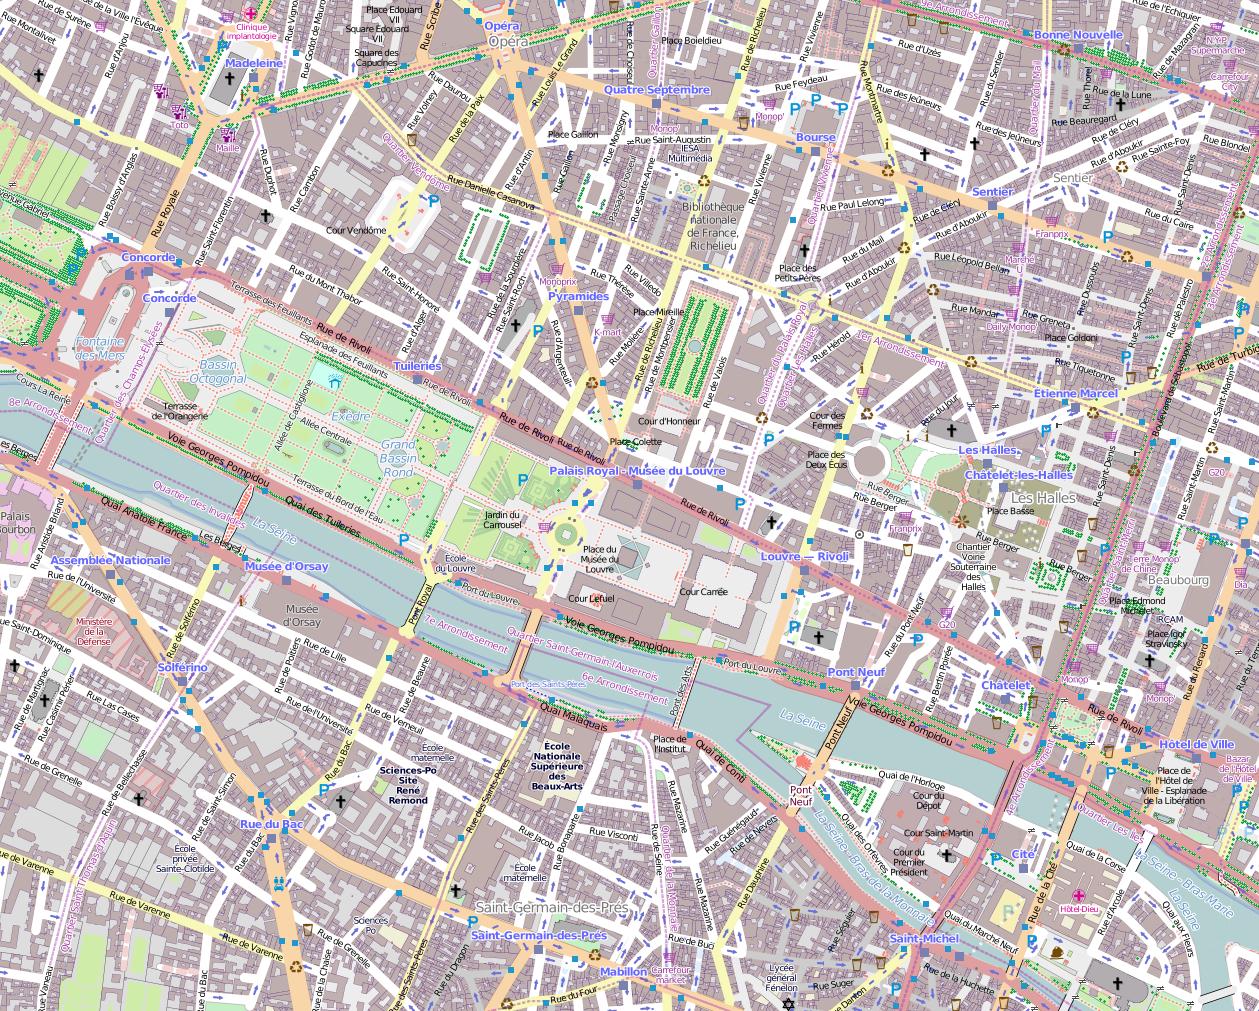 Printable Street Map Of Paris Download Map Paris France Streets - Paris Street Map Printable